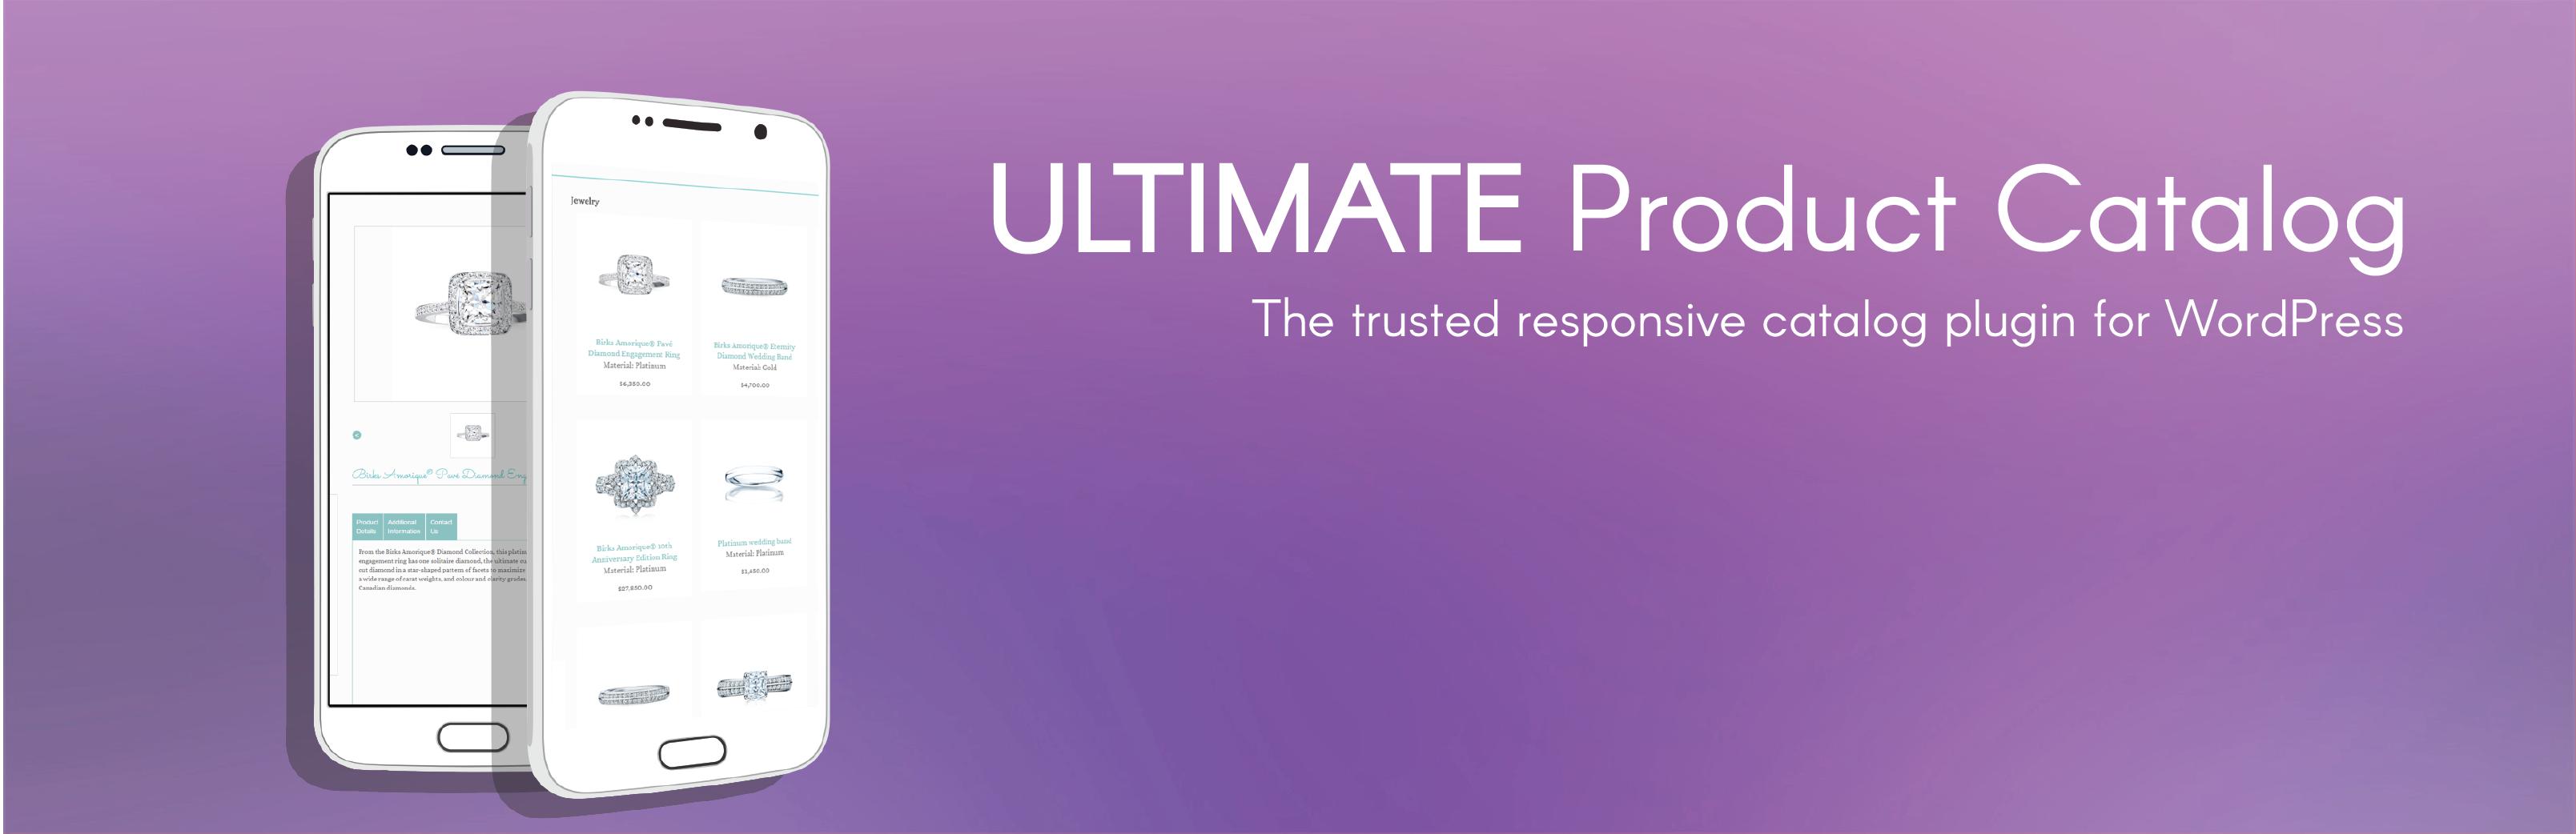 Ultimate Product Catalog Plugin